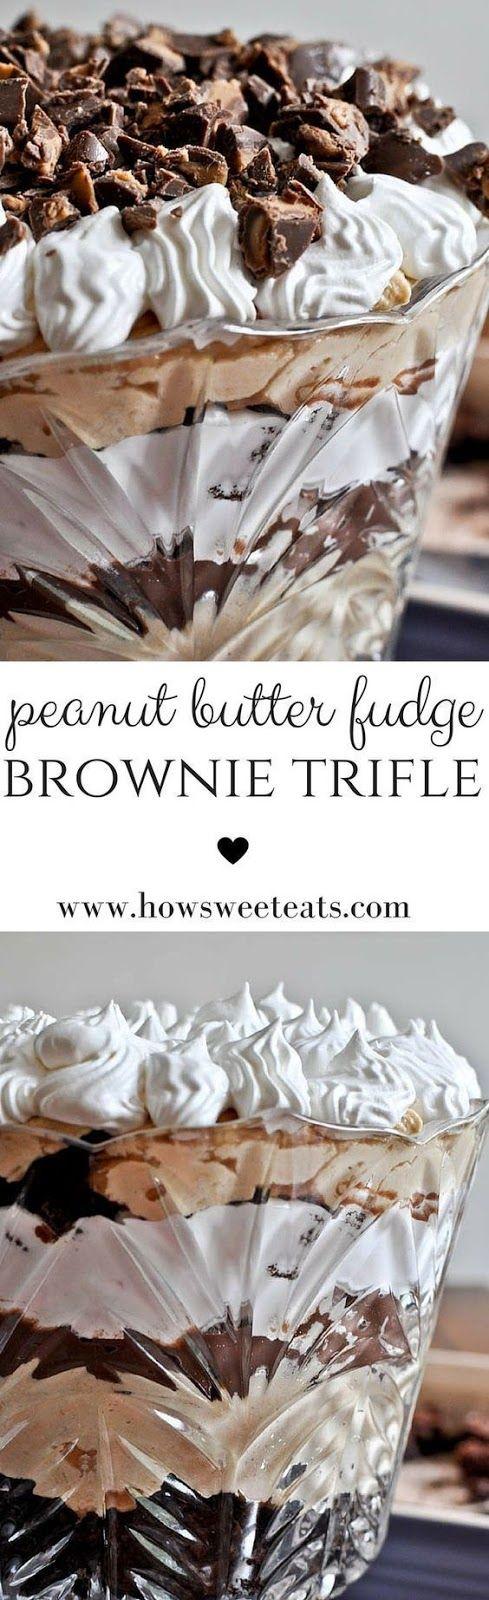 PEANUT BUTTER FUDGE BROWNIE TRIFLE   Cathy Kitchen desserts dessertrecipes is part of Brownie trifle -